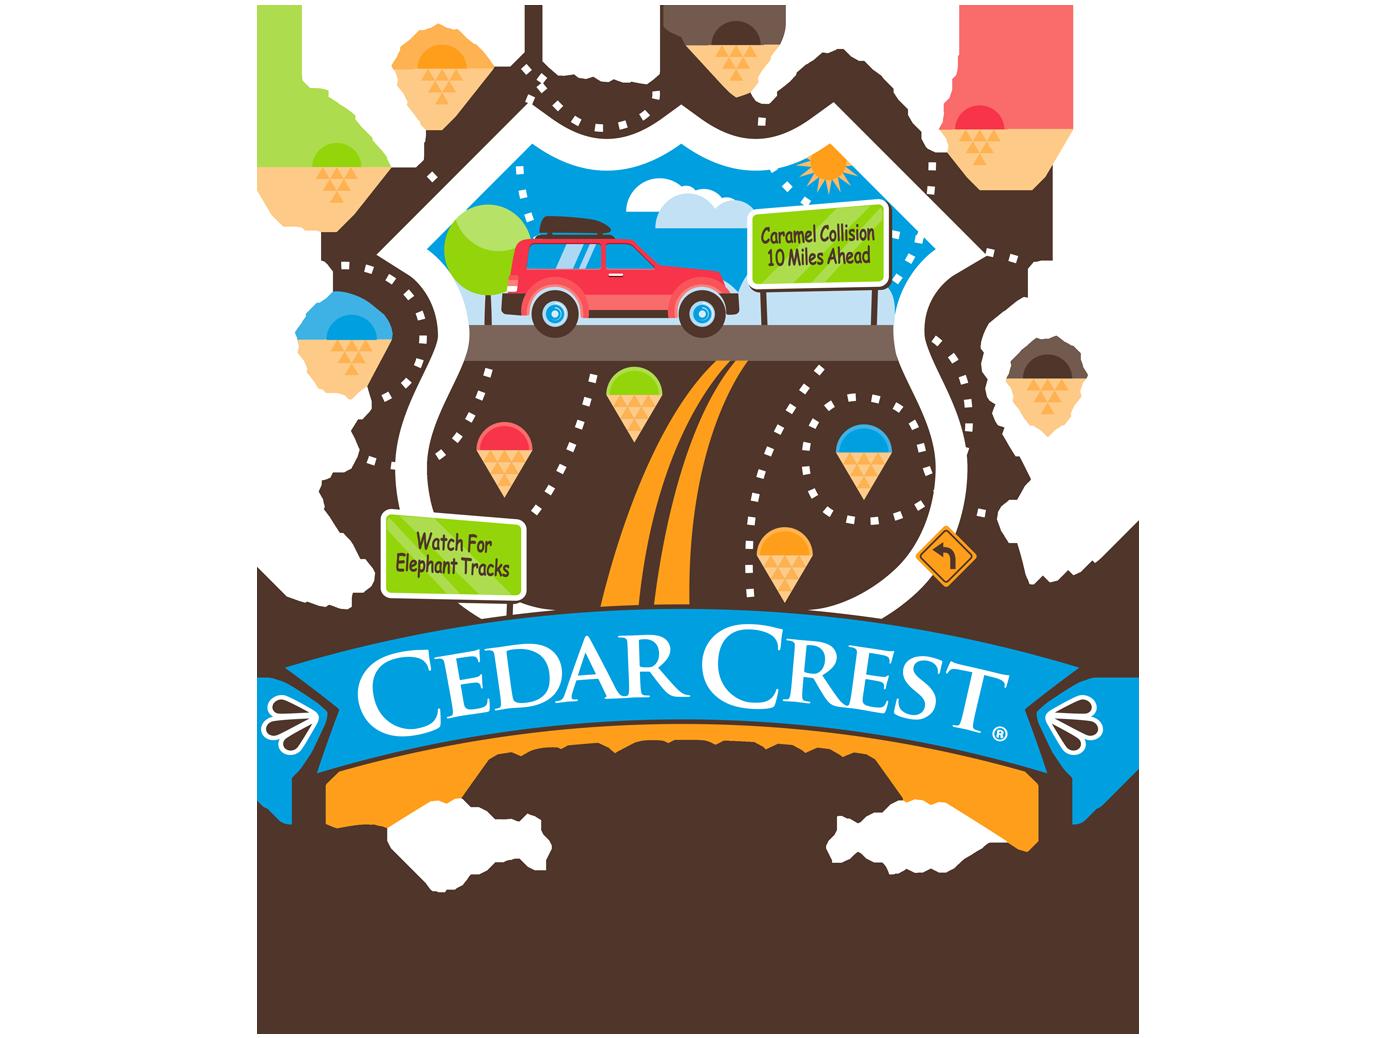 Parlor cedar crest ice. Clipart road road trip